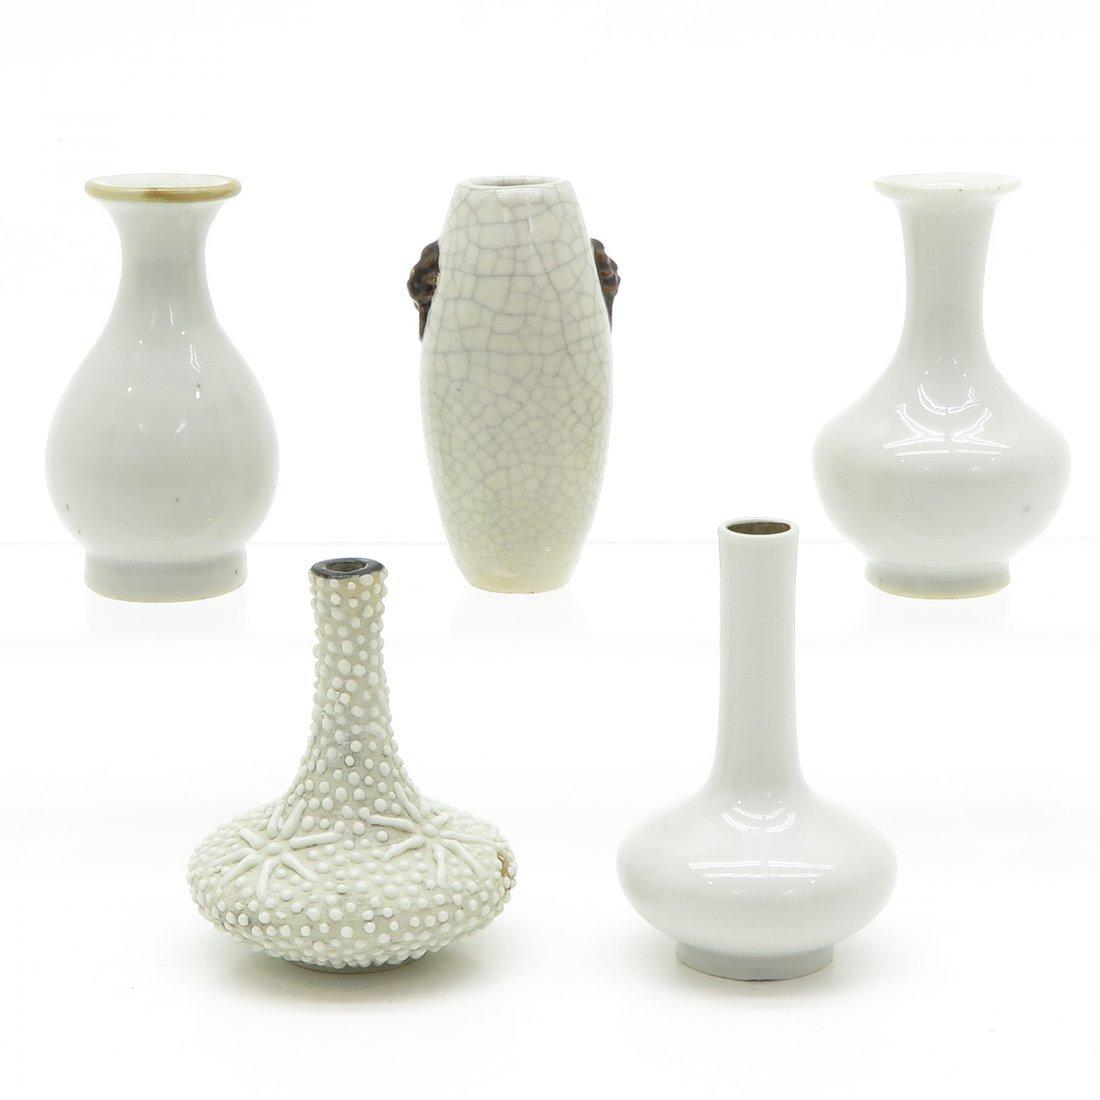 Lot of 5 China Porcelain Miniature Vases